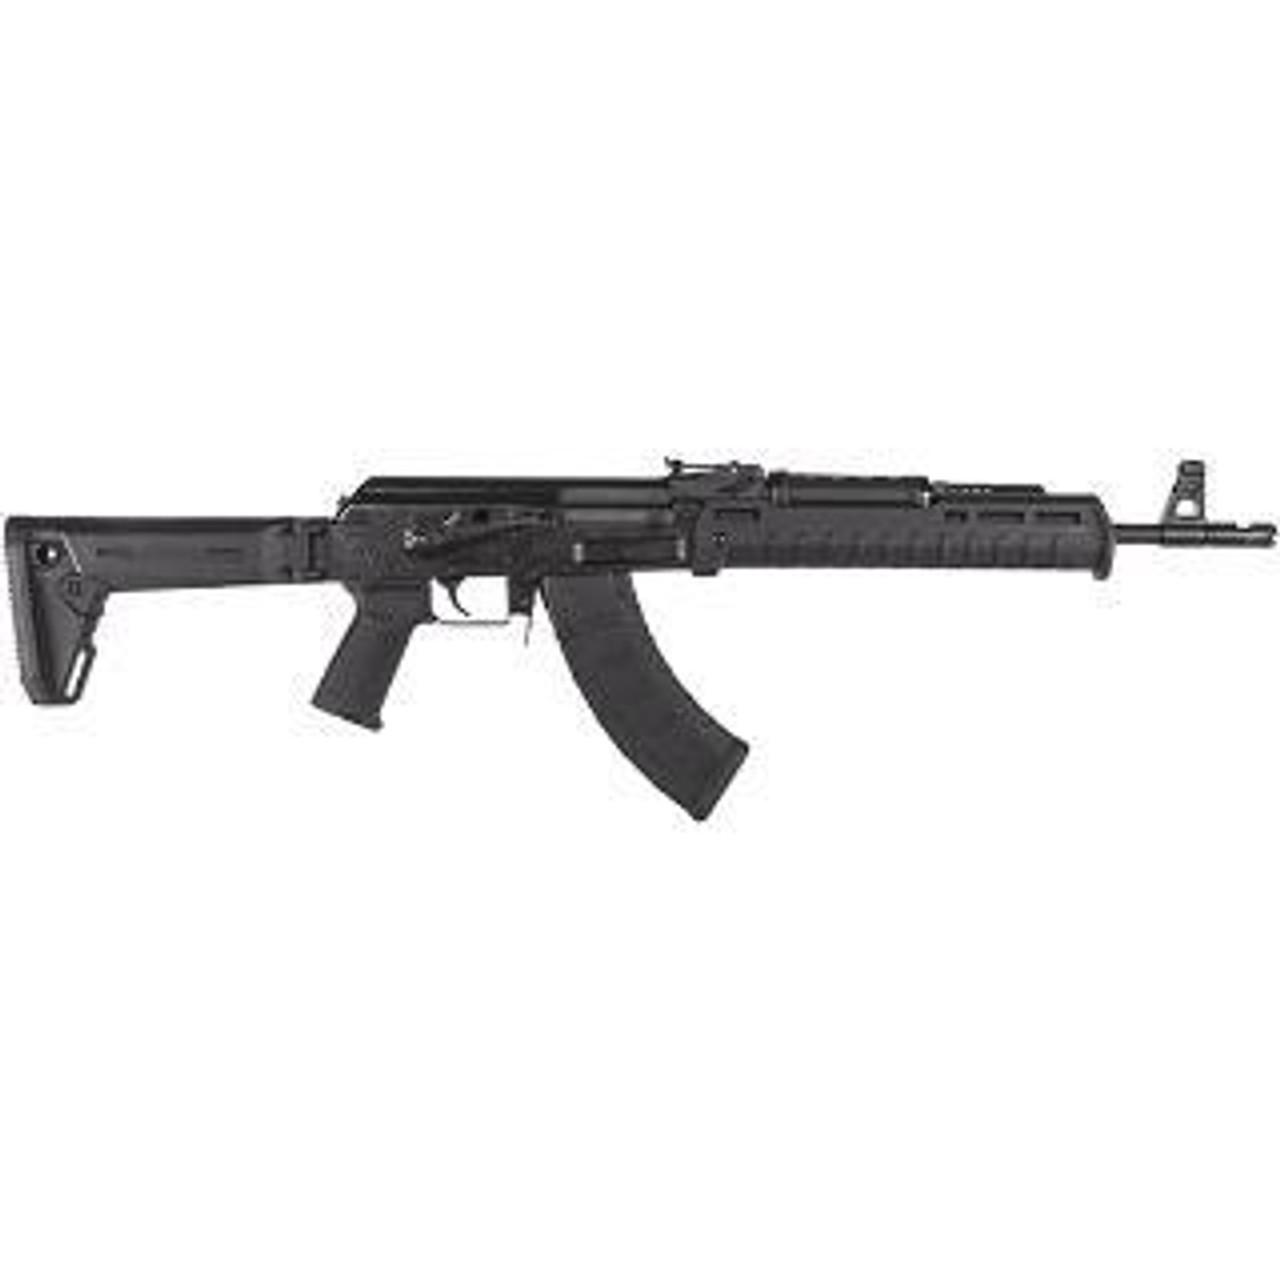 Century Arms C39v2 ZHUKOV MAGPUL CALIFORNIA LEGAL-7.62x39